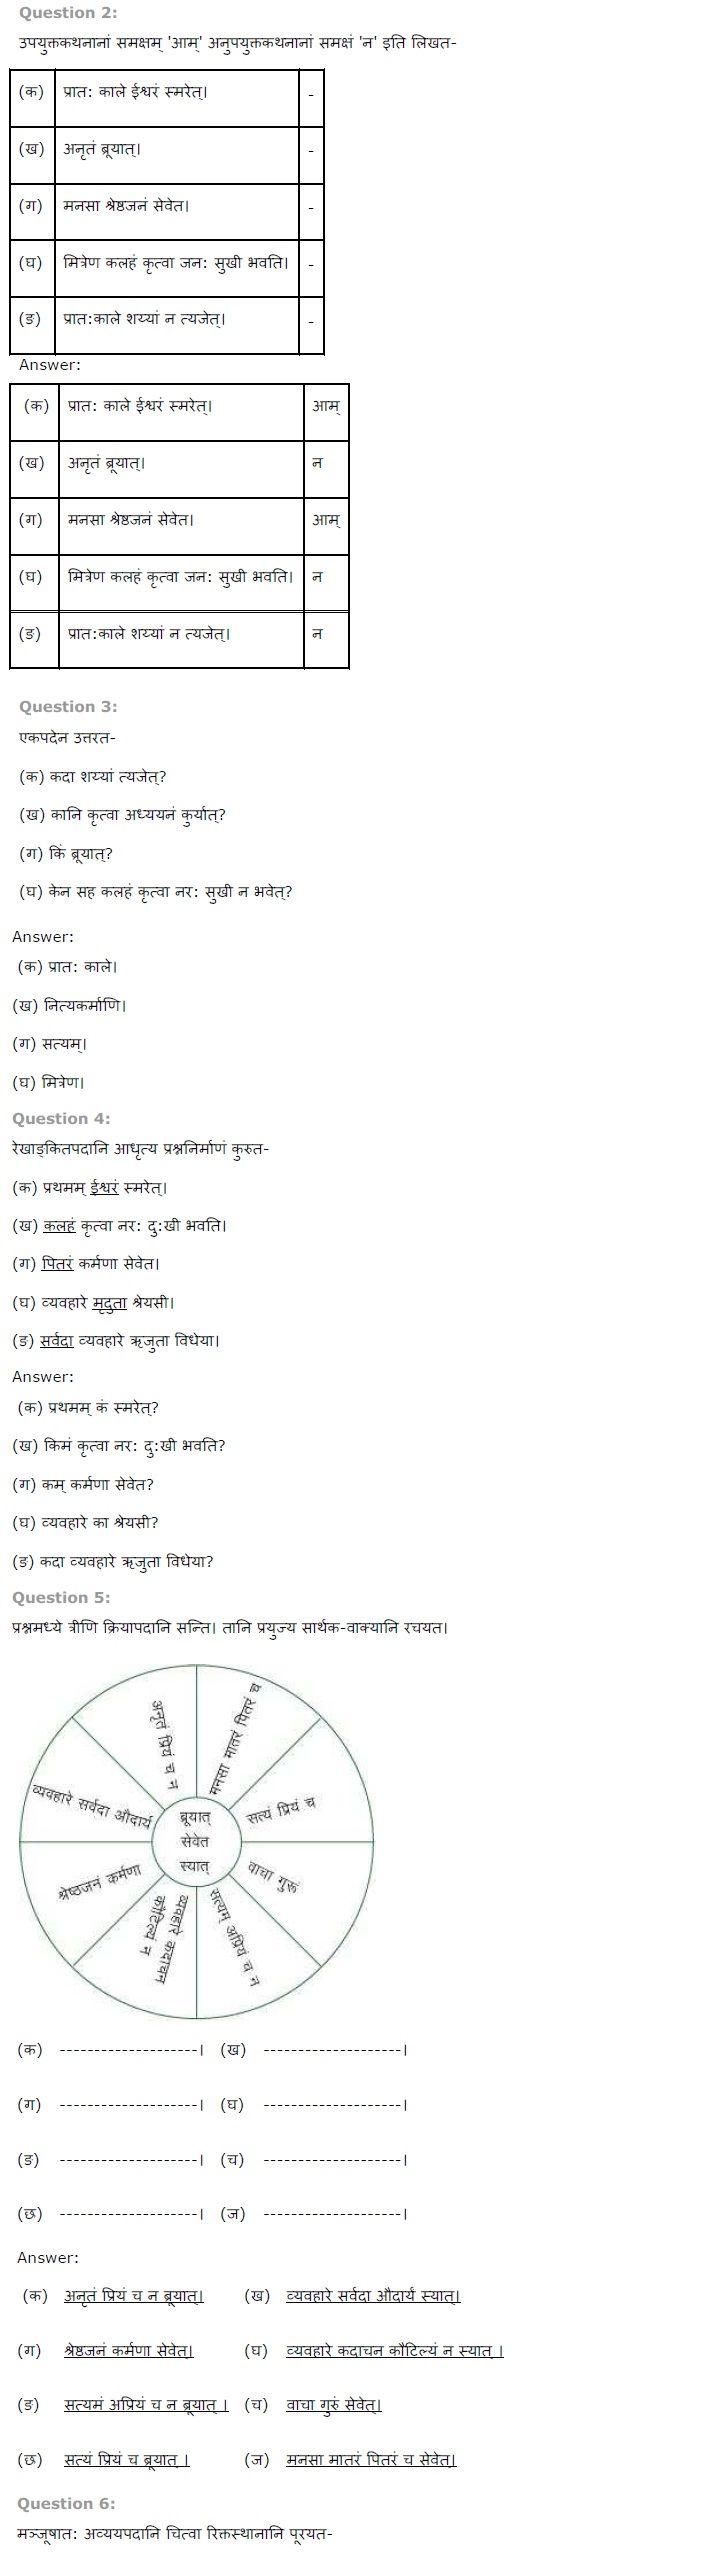 NCERT Solutions for Class 7th Sanskrit Chapter 6 - सदाचार#NCERT #NCERTsolutions #CBSE #CBSEclass7 #CBSEclass7Sanskrit